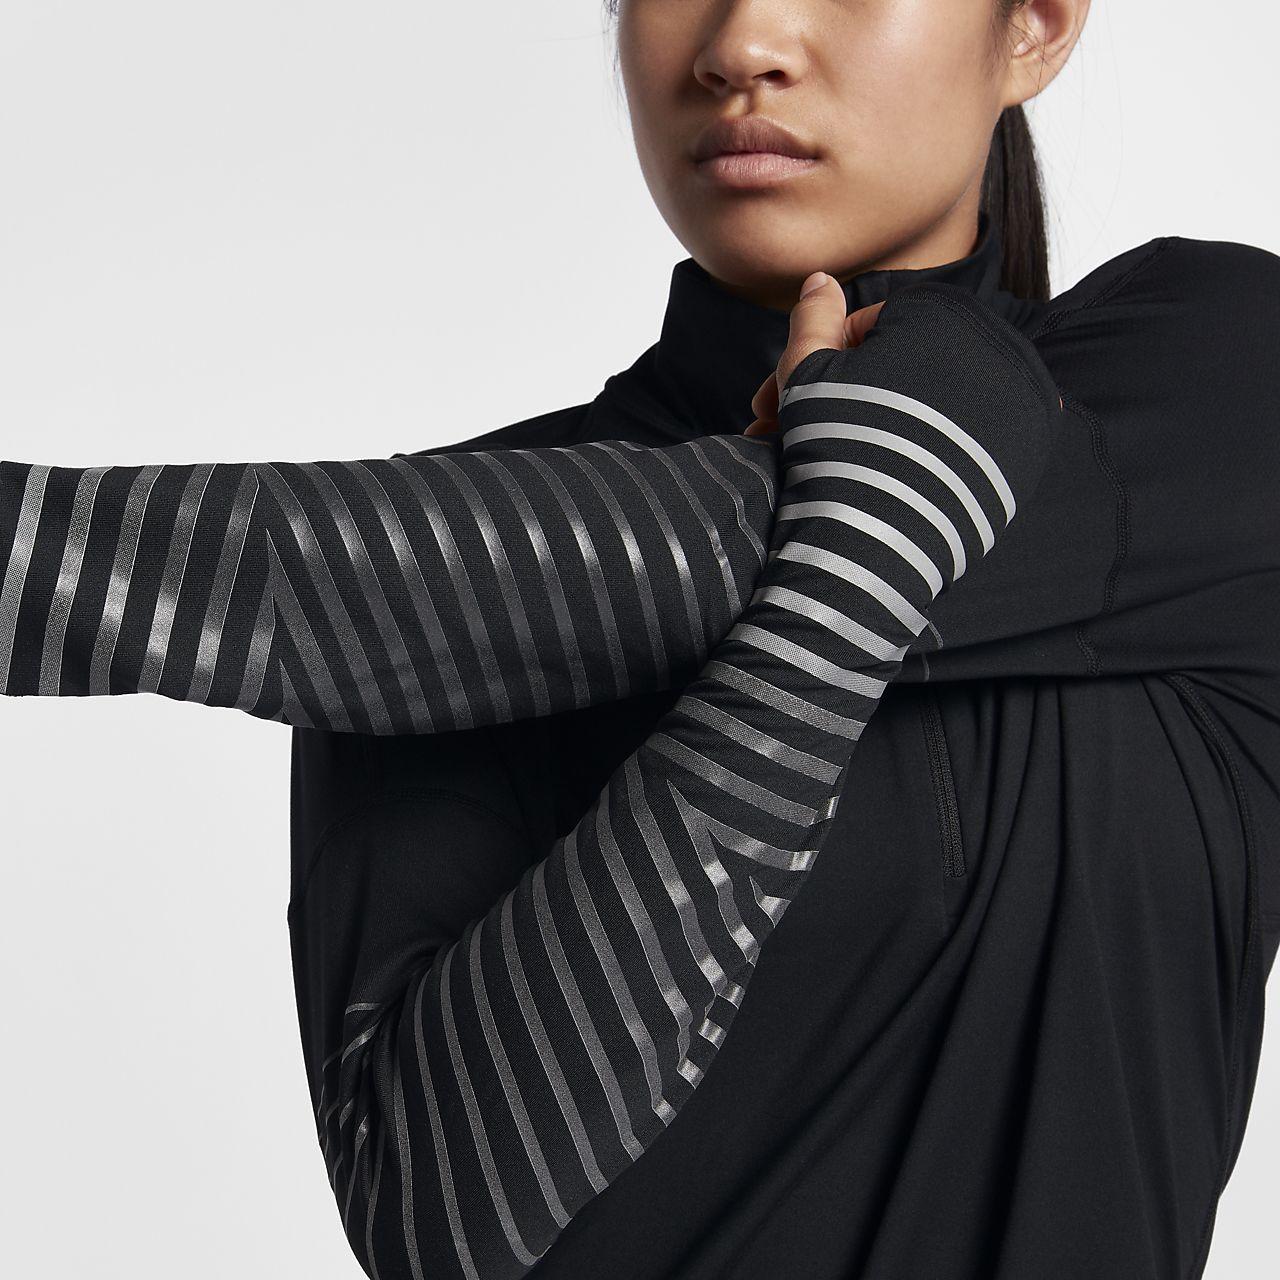 31f91756a35b Nike Dri-FIT Element Flash Women s Reflective Long-Sleeve Running ...